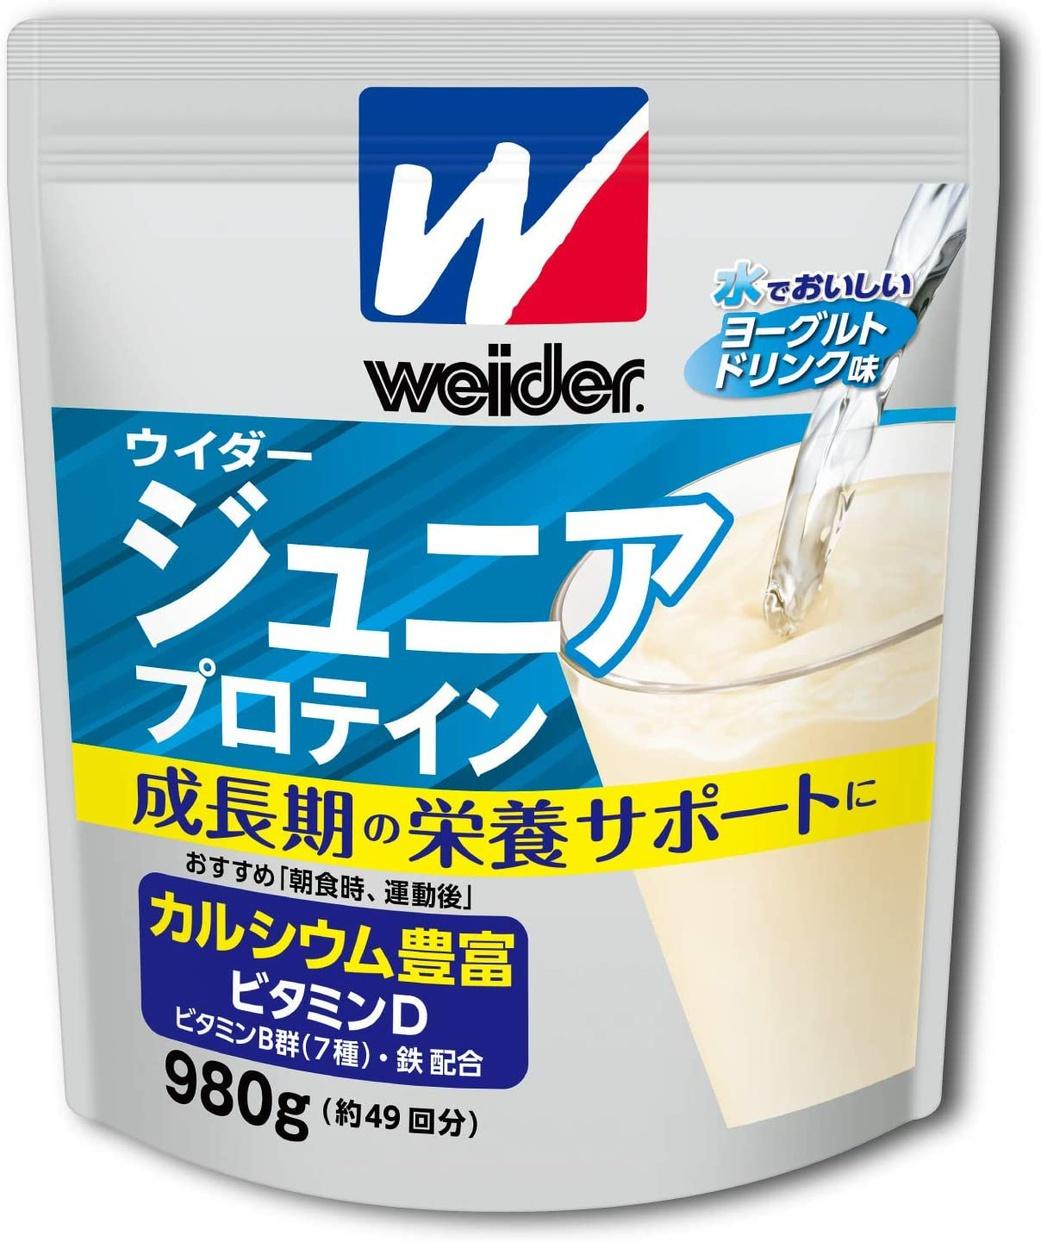 weider(ウイダー) ジュニアプロテインの商品画像